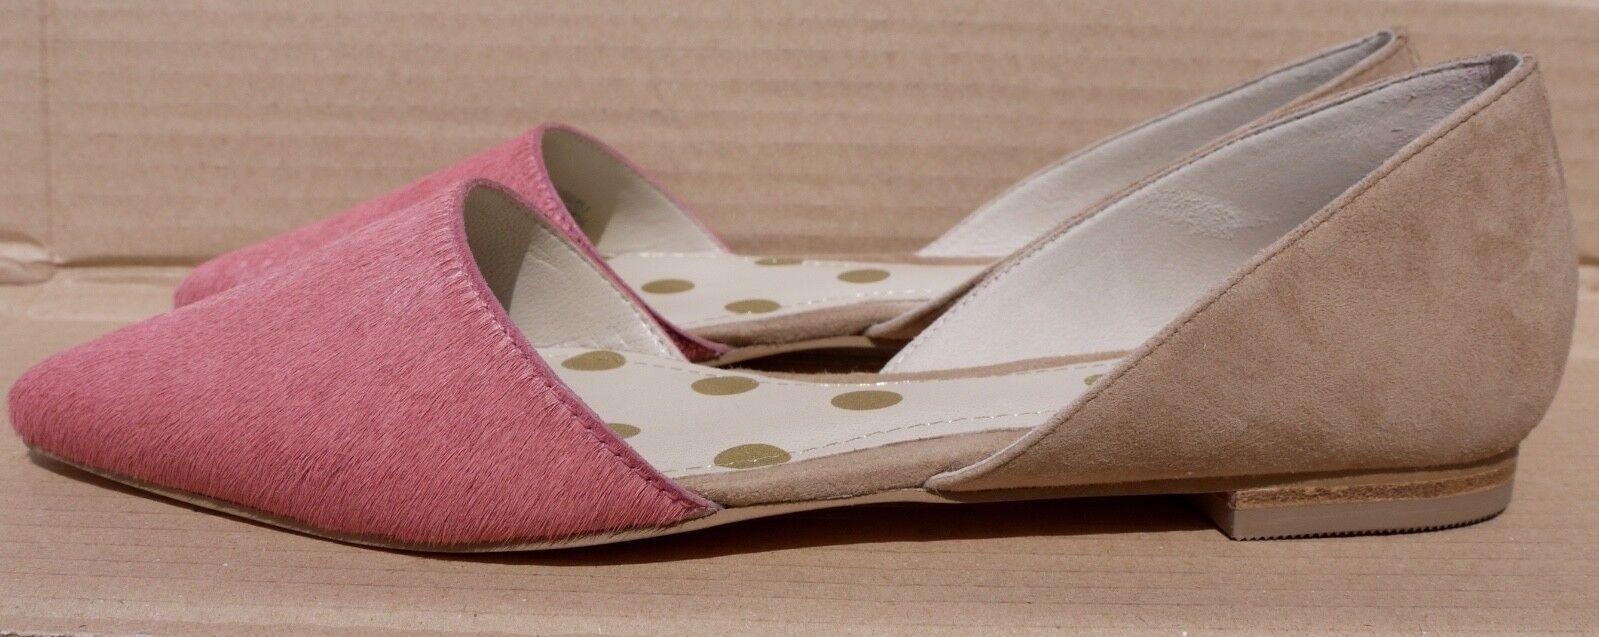 Boden suede and Leder flat schuhe rose pink & tan UK 5.5 EU 38.5 BNIB